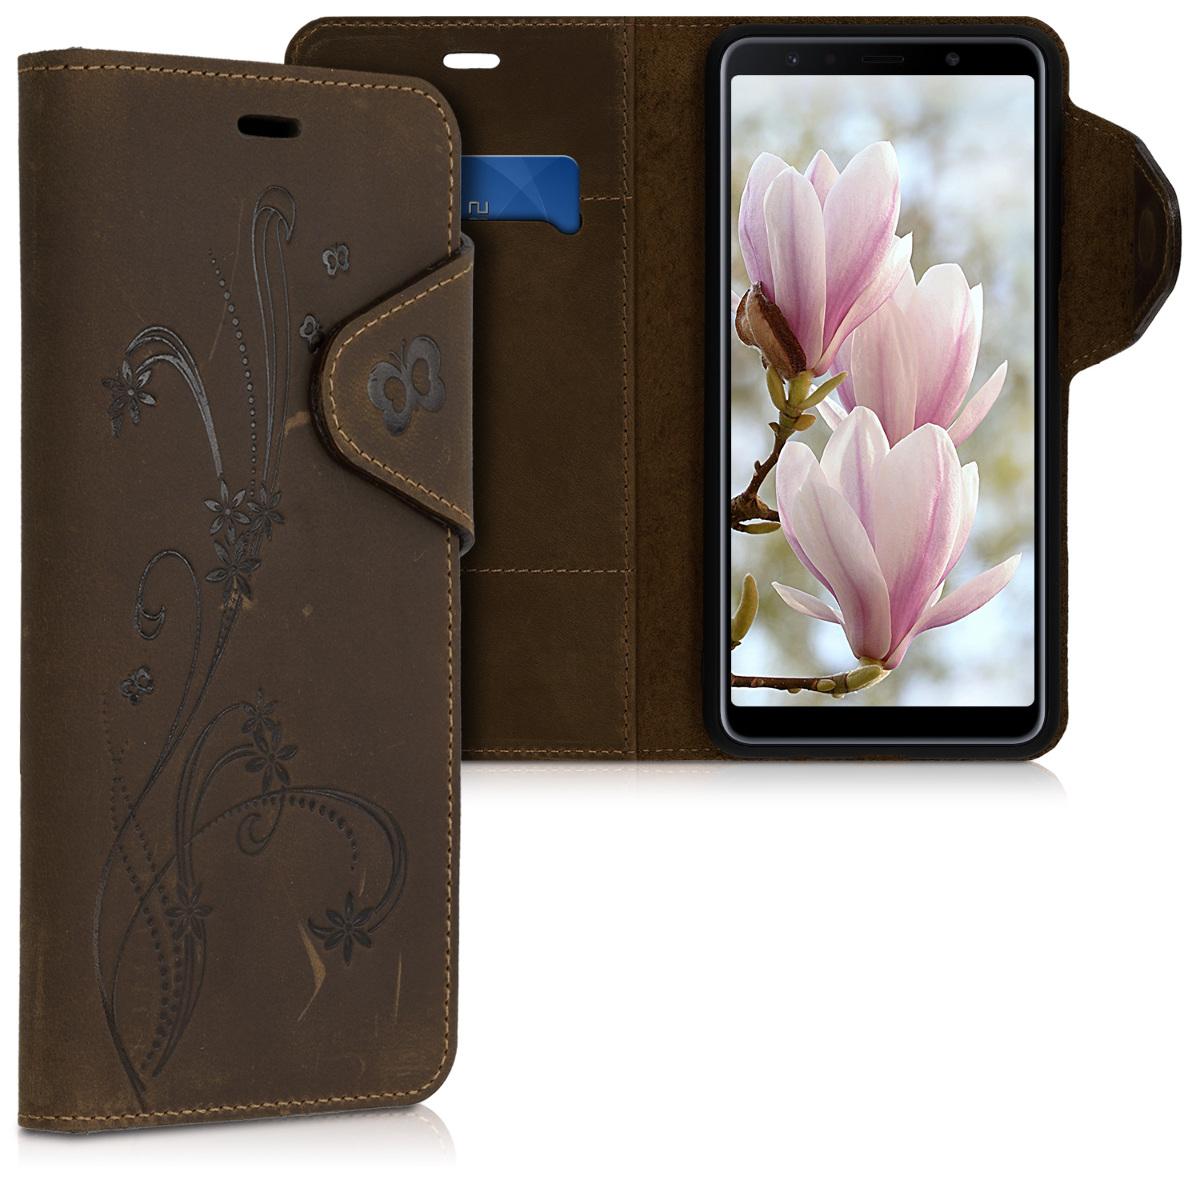 Kalibri Δερμάτινη Suede Θήκη Πορτοφόλι Samsung Galaxy A7 2018 - Brown (47117.03)